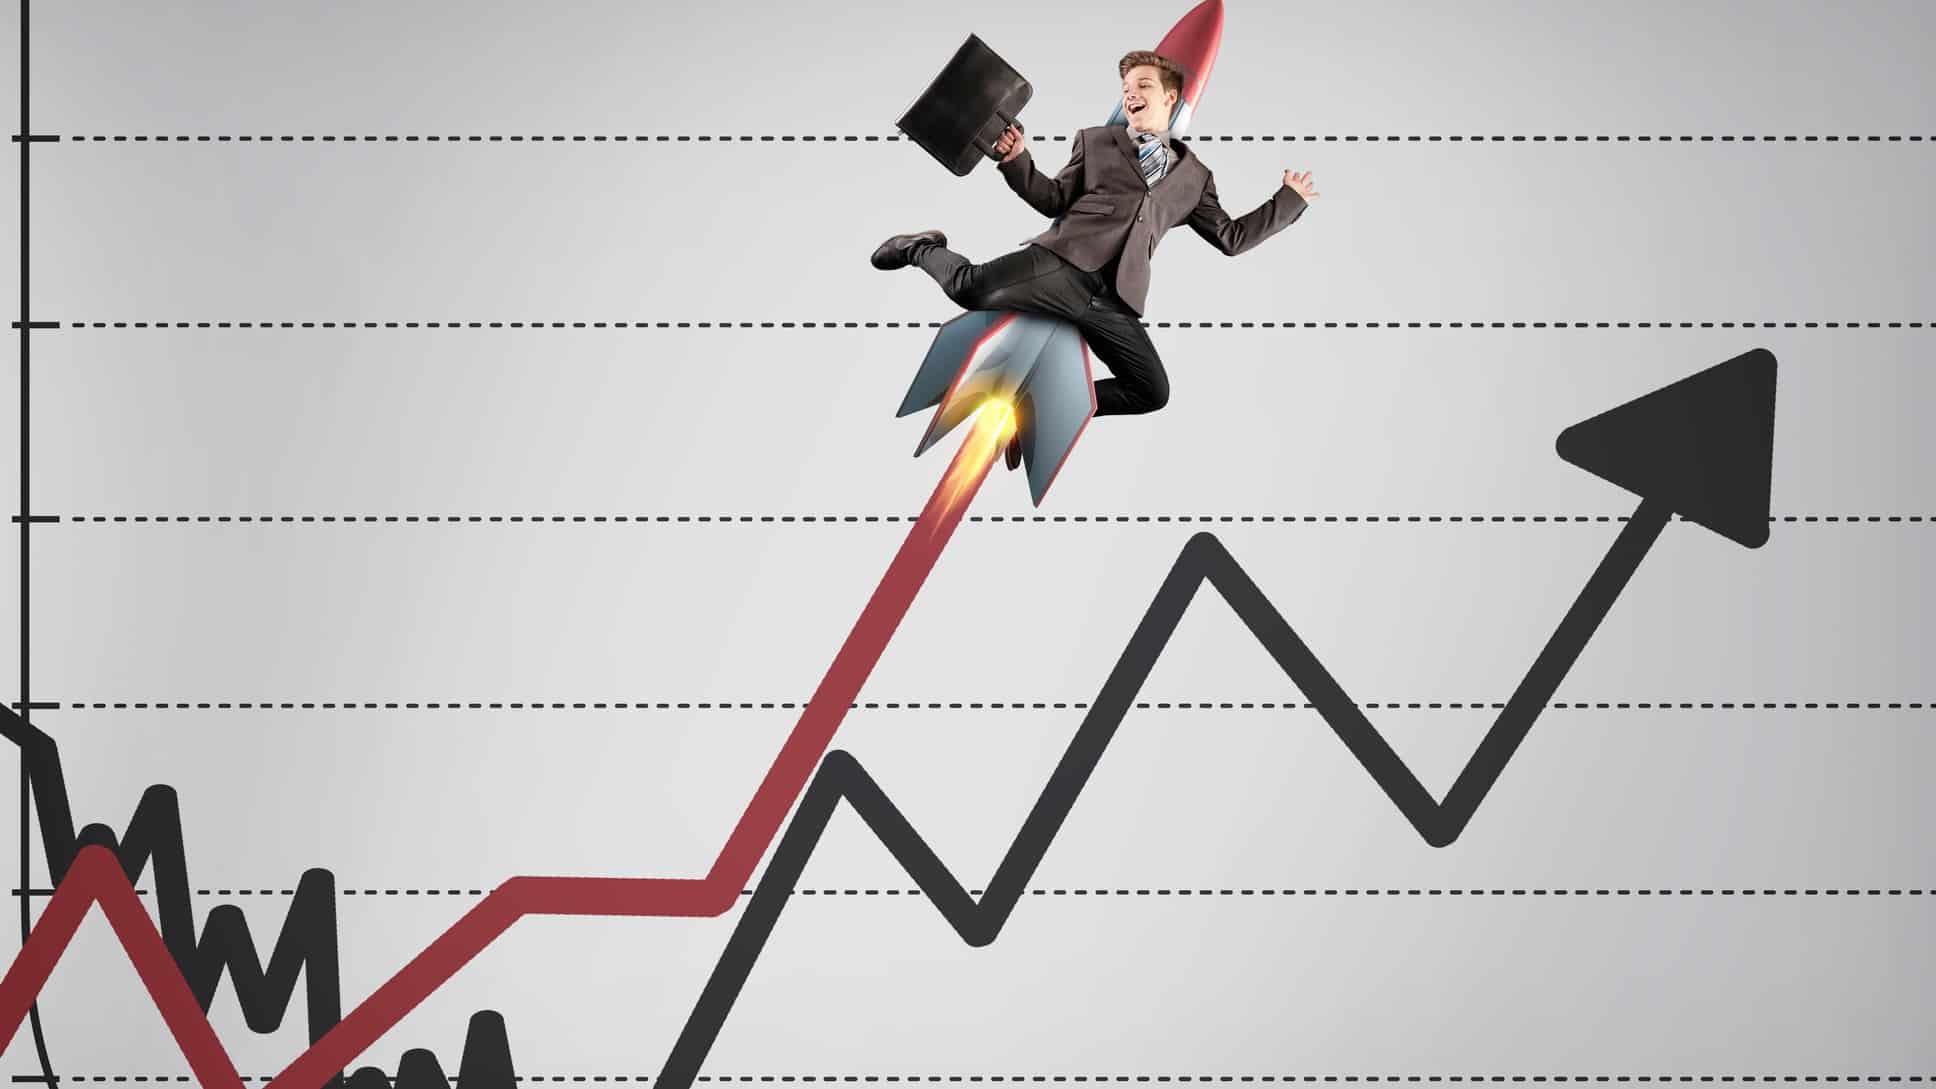 businessman riding rocket on line graph